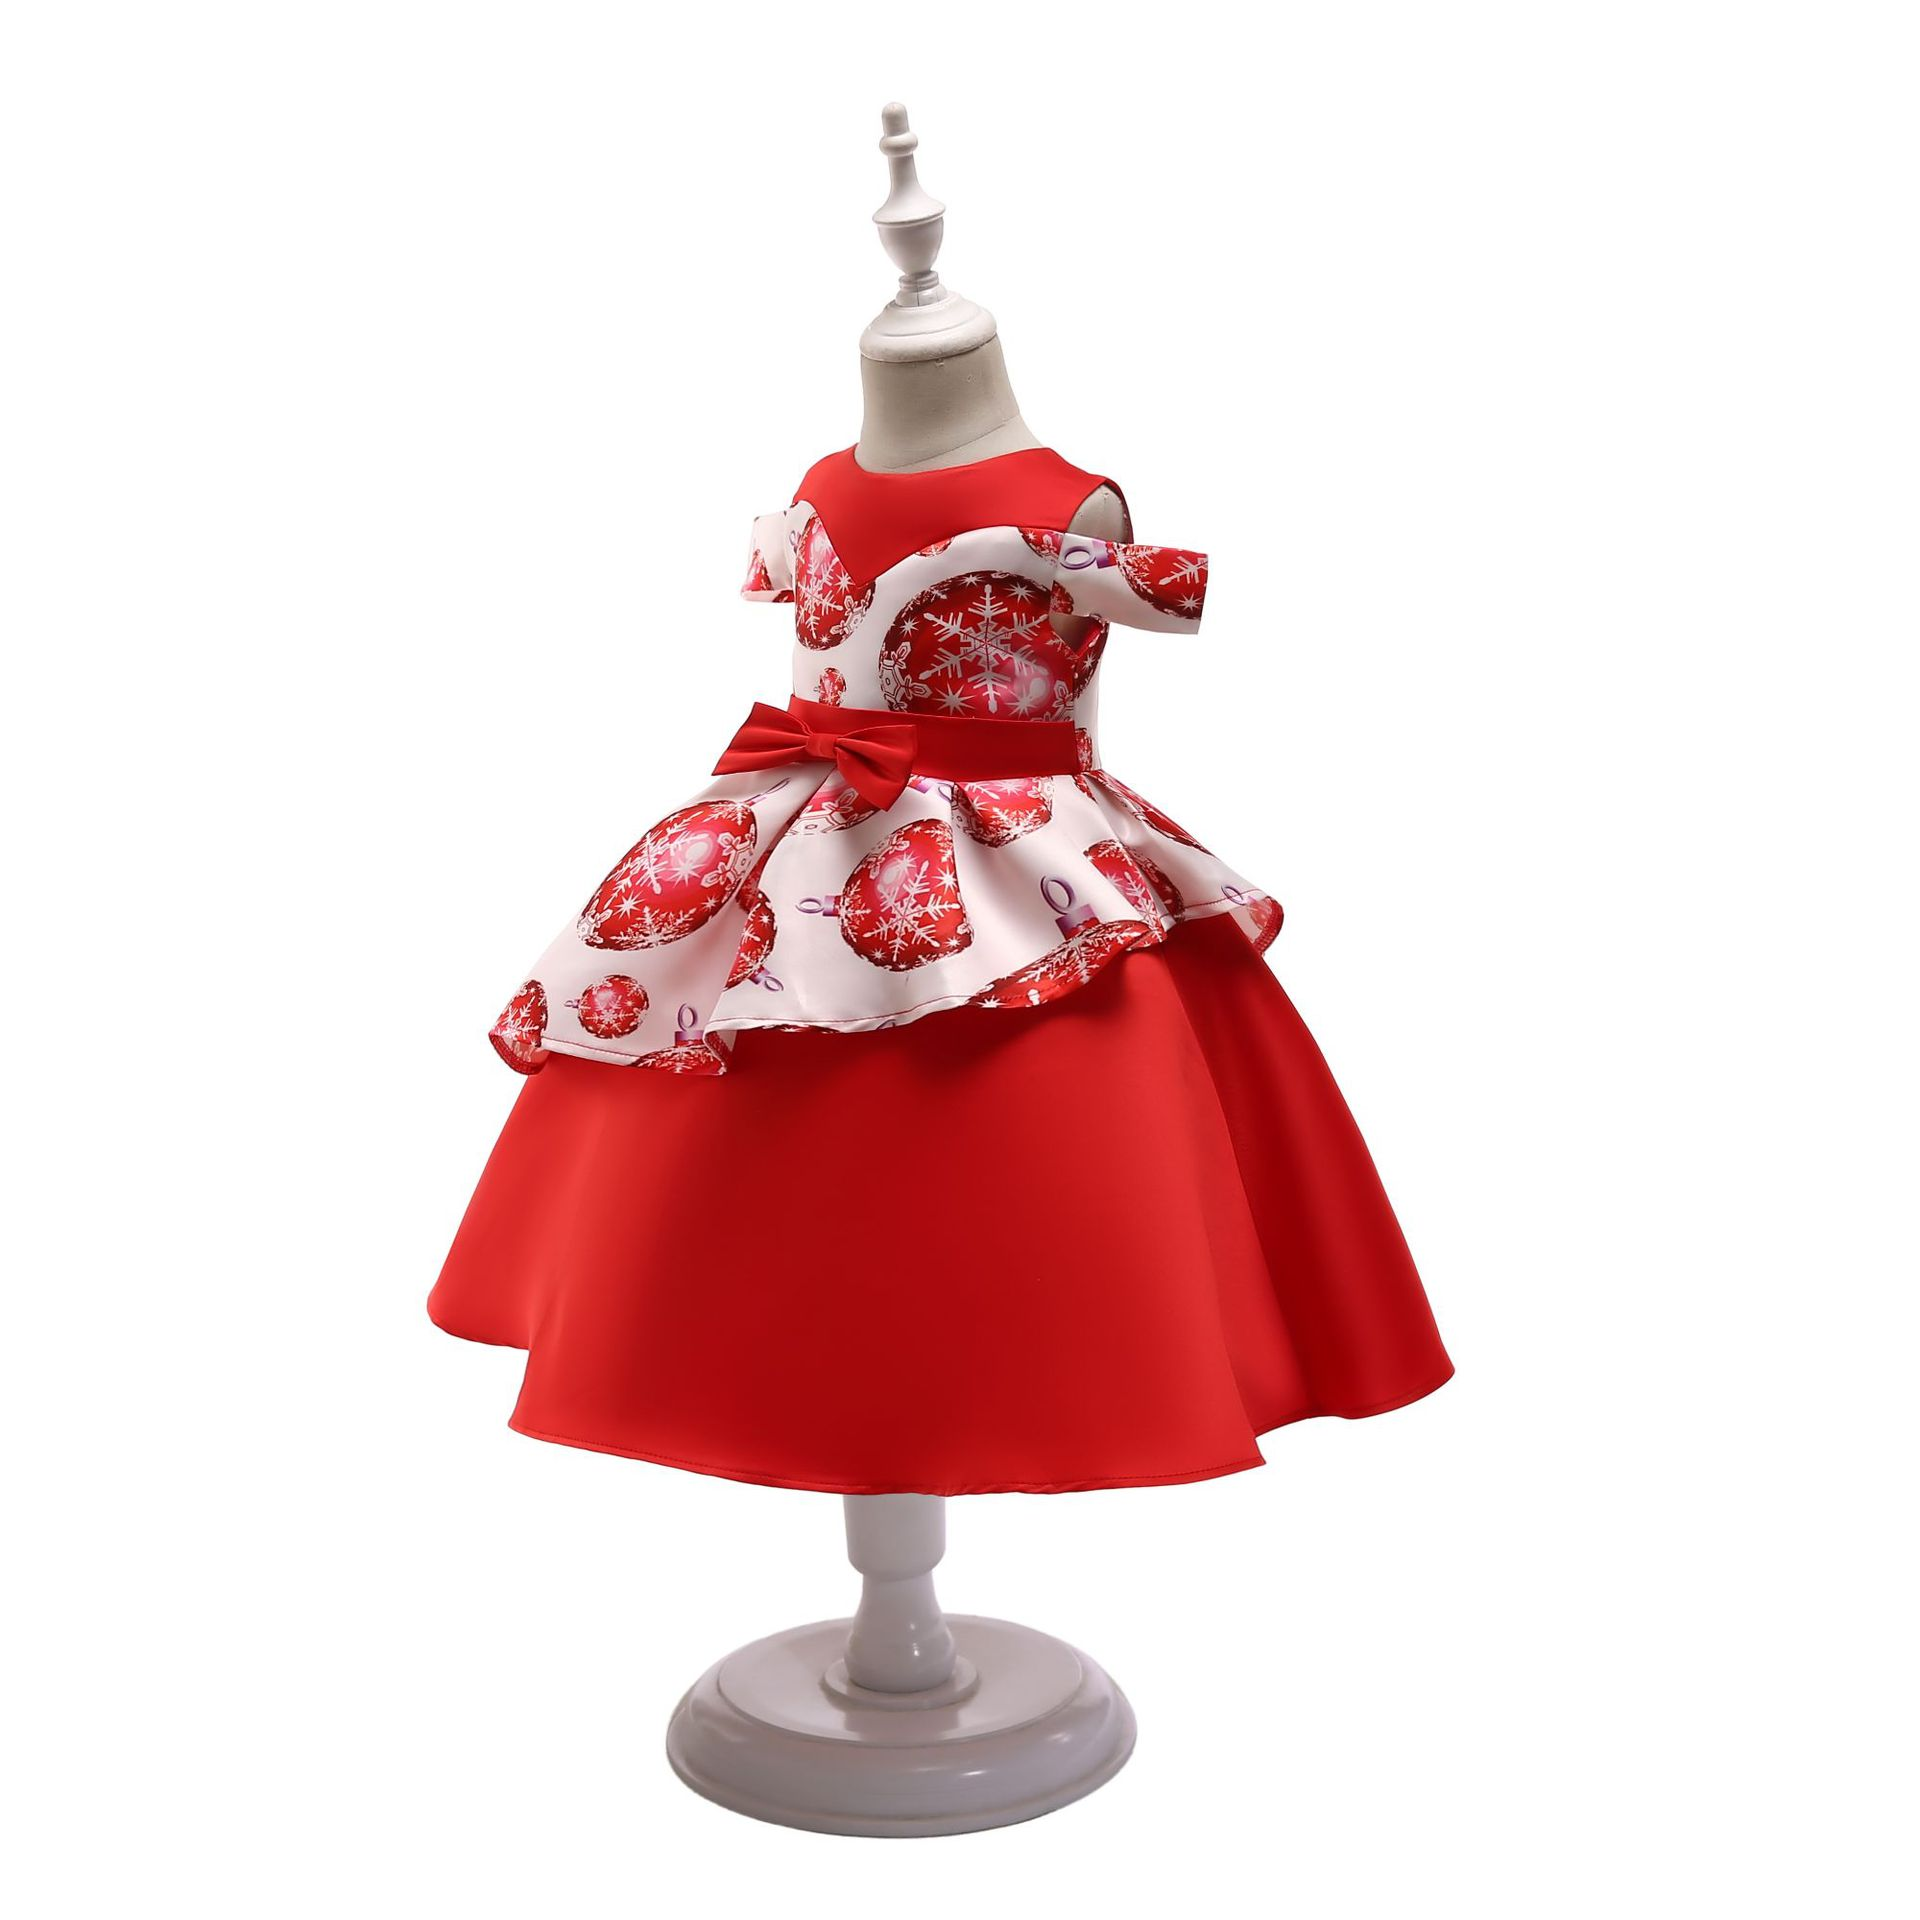 89c2f97b8 Buy Summer Fashion Girls New Year Festival Print Dress Princess ...